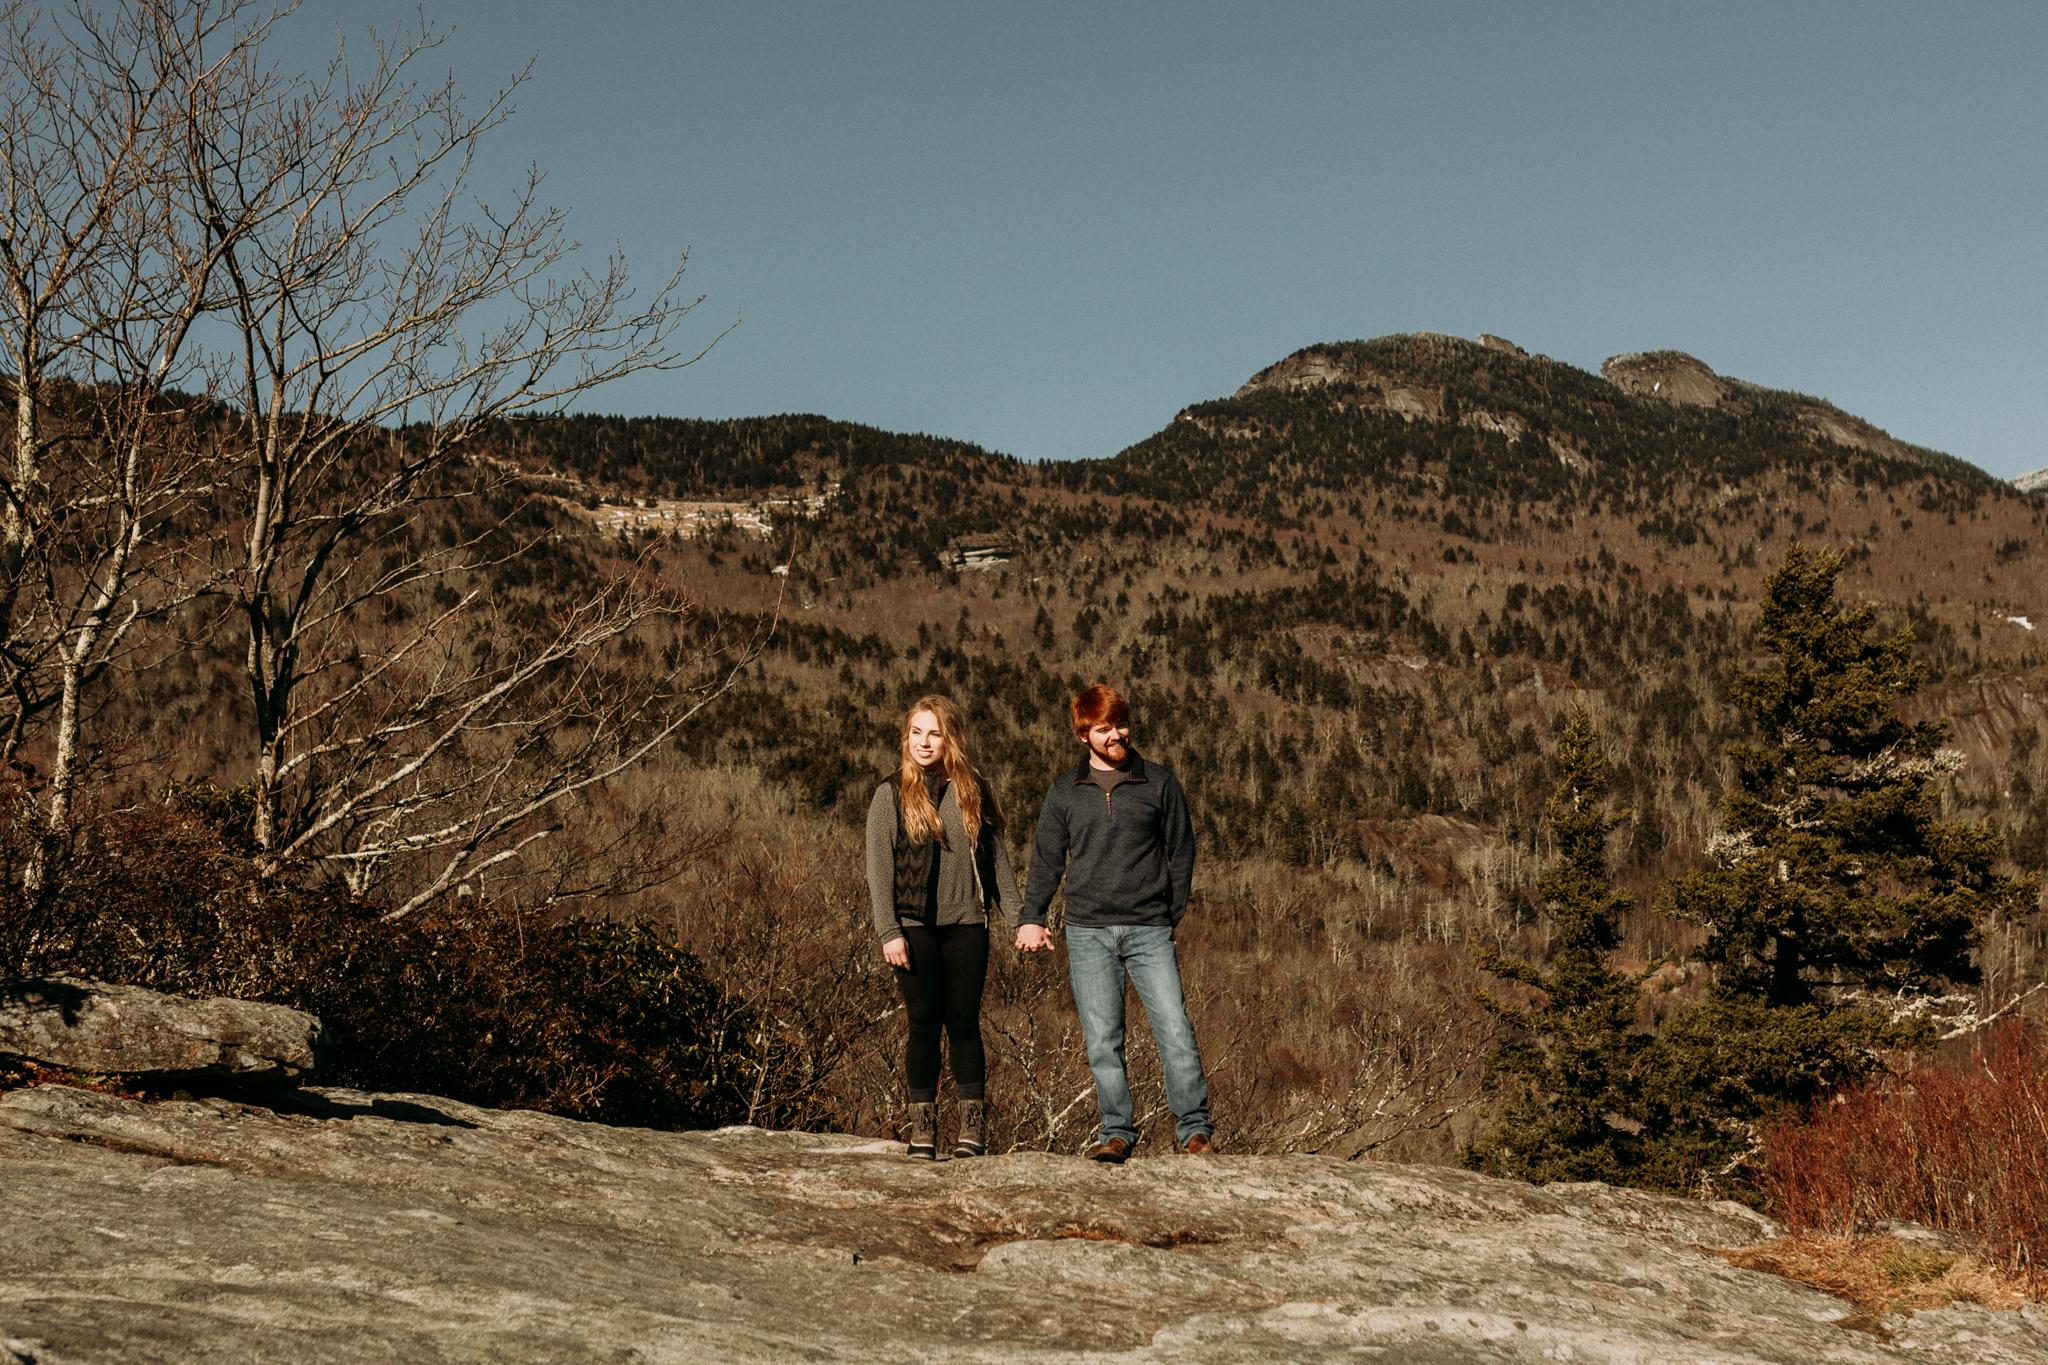 MonicaLeavellPhoto-AshleyMitch-NorthCarolina-Adventure-Engagement-Photographer-7.jpg